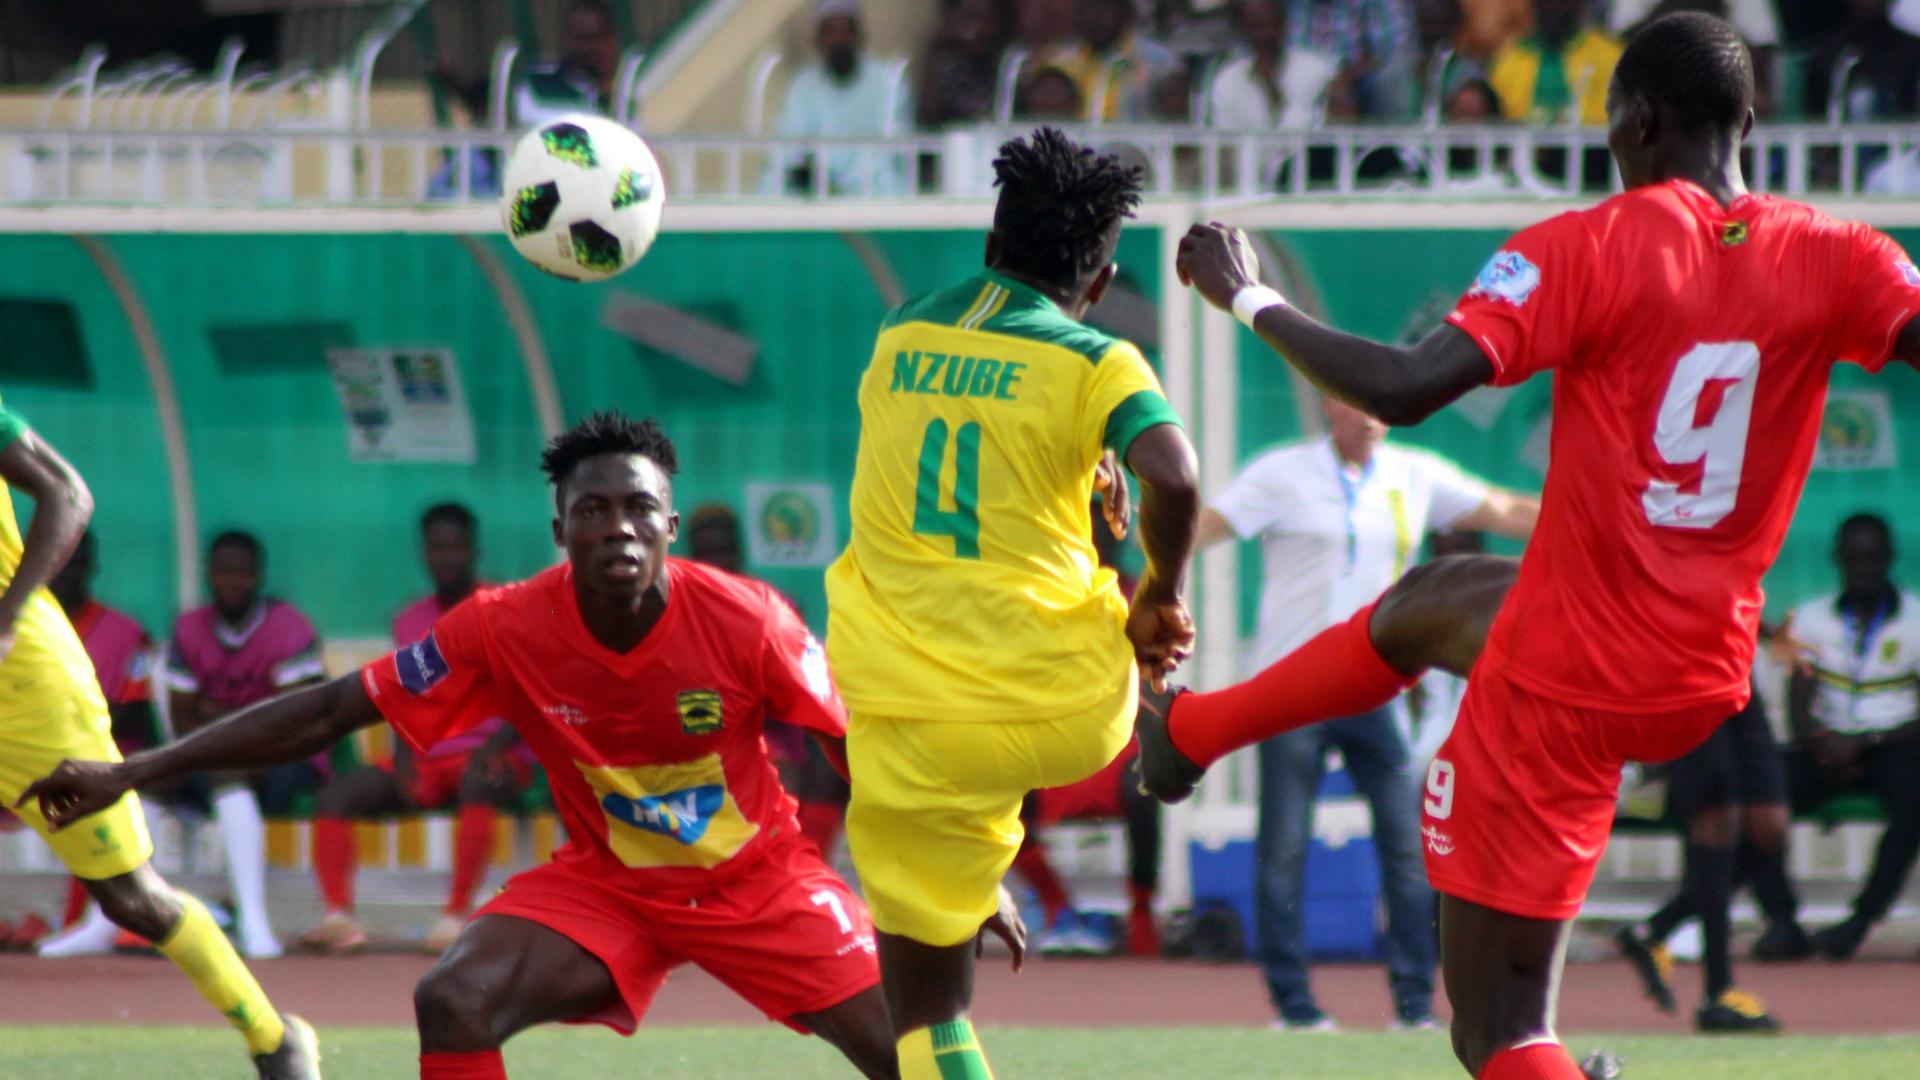 Caf Champions League: Kano Pillars in Ghana to beat Asante Kotoko - Ibrahim Musa